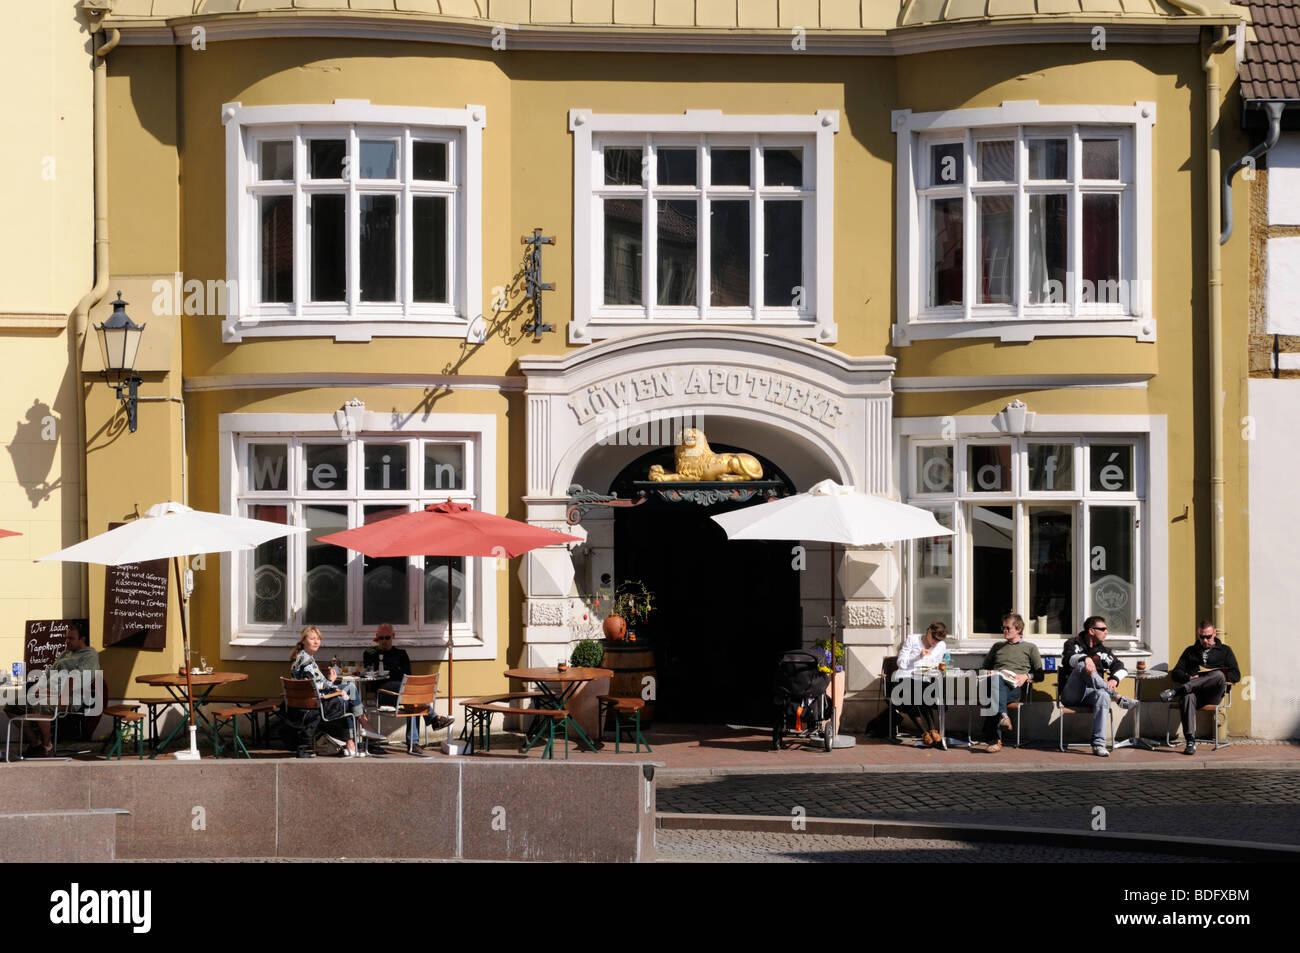 Straßencafe in Wismar Mecklenburg Vorpommern Deutschland Sidewalk cafe in Wismar Mecklenburg Western Pomerania - Stock Image